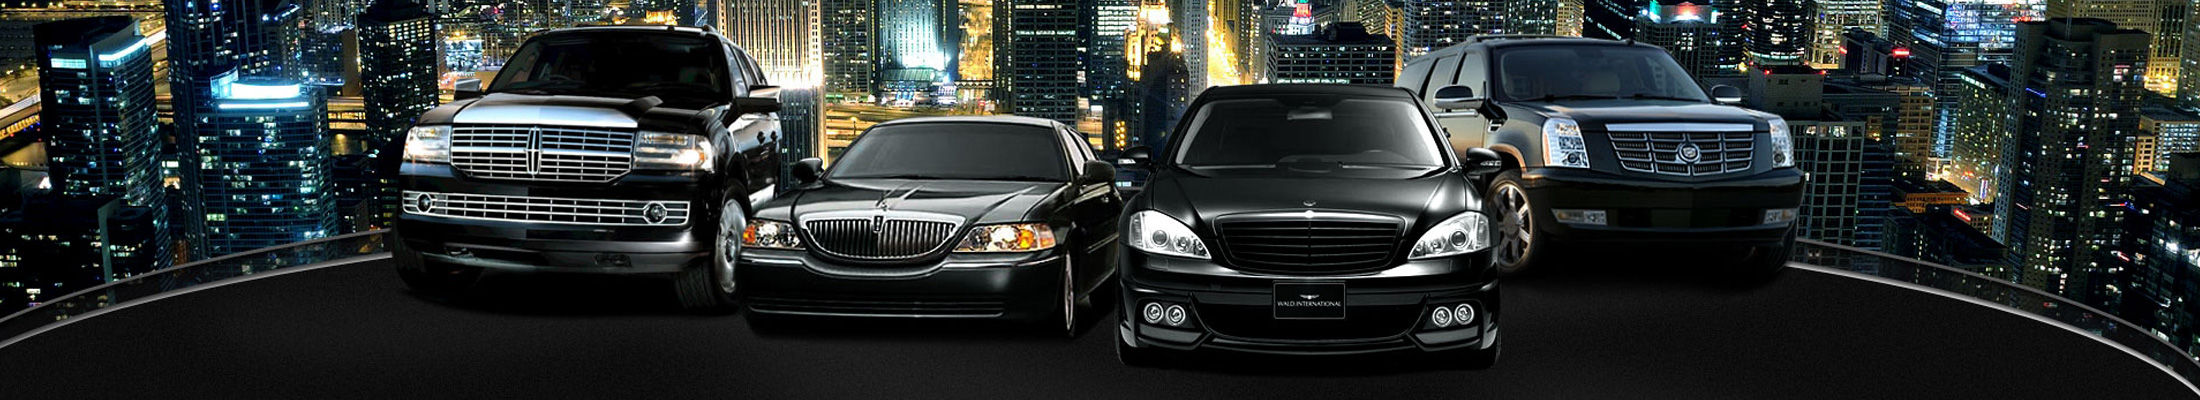 Black Sedan Fleet